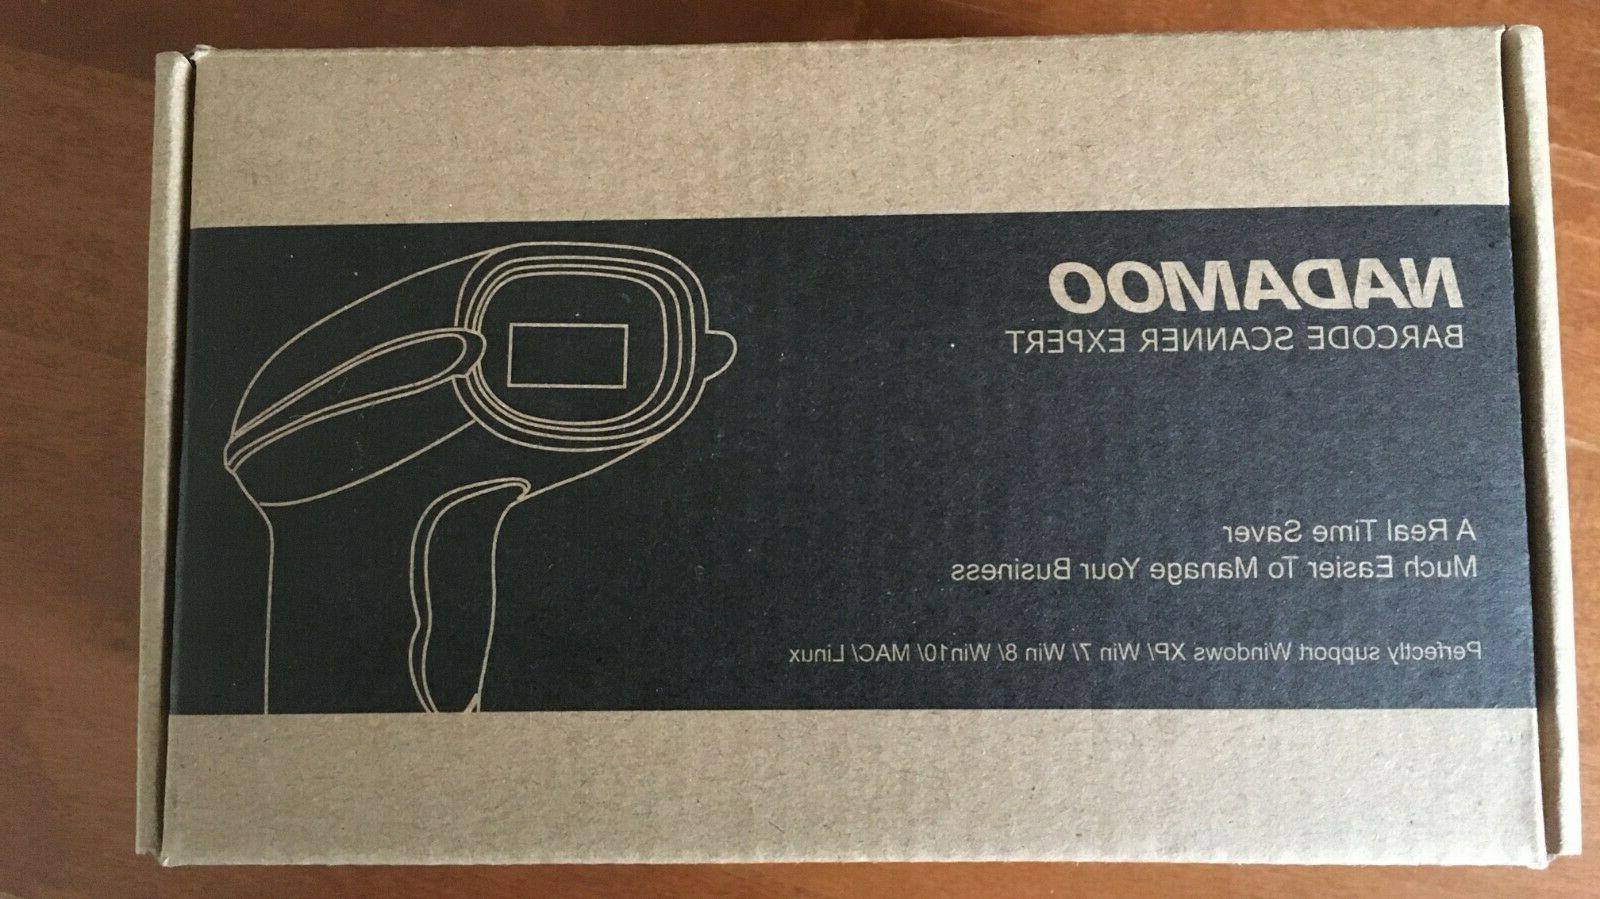 yhd 5100 usb handheld barcode scanner reader